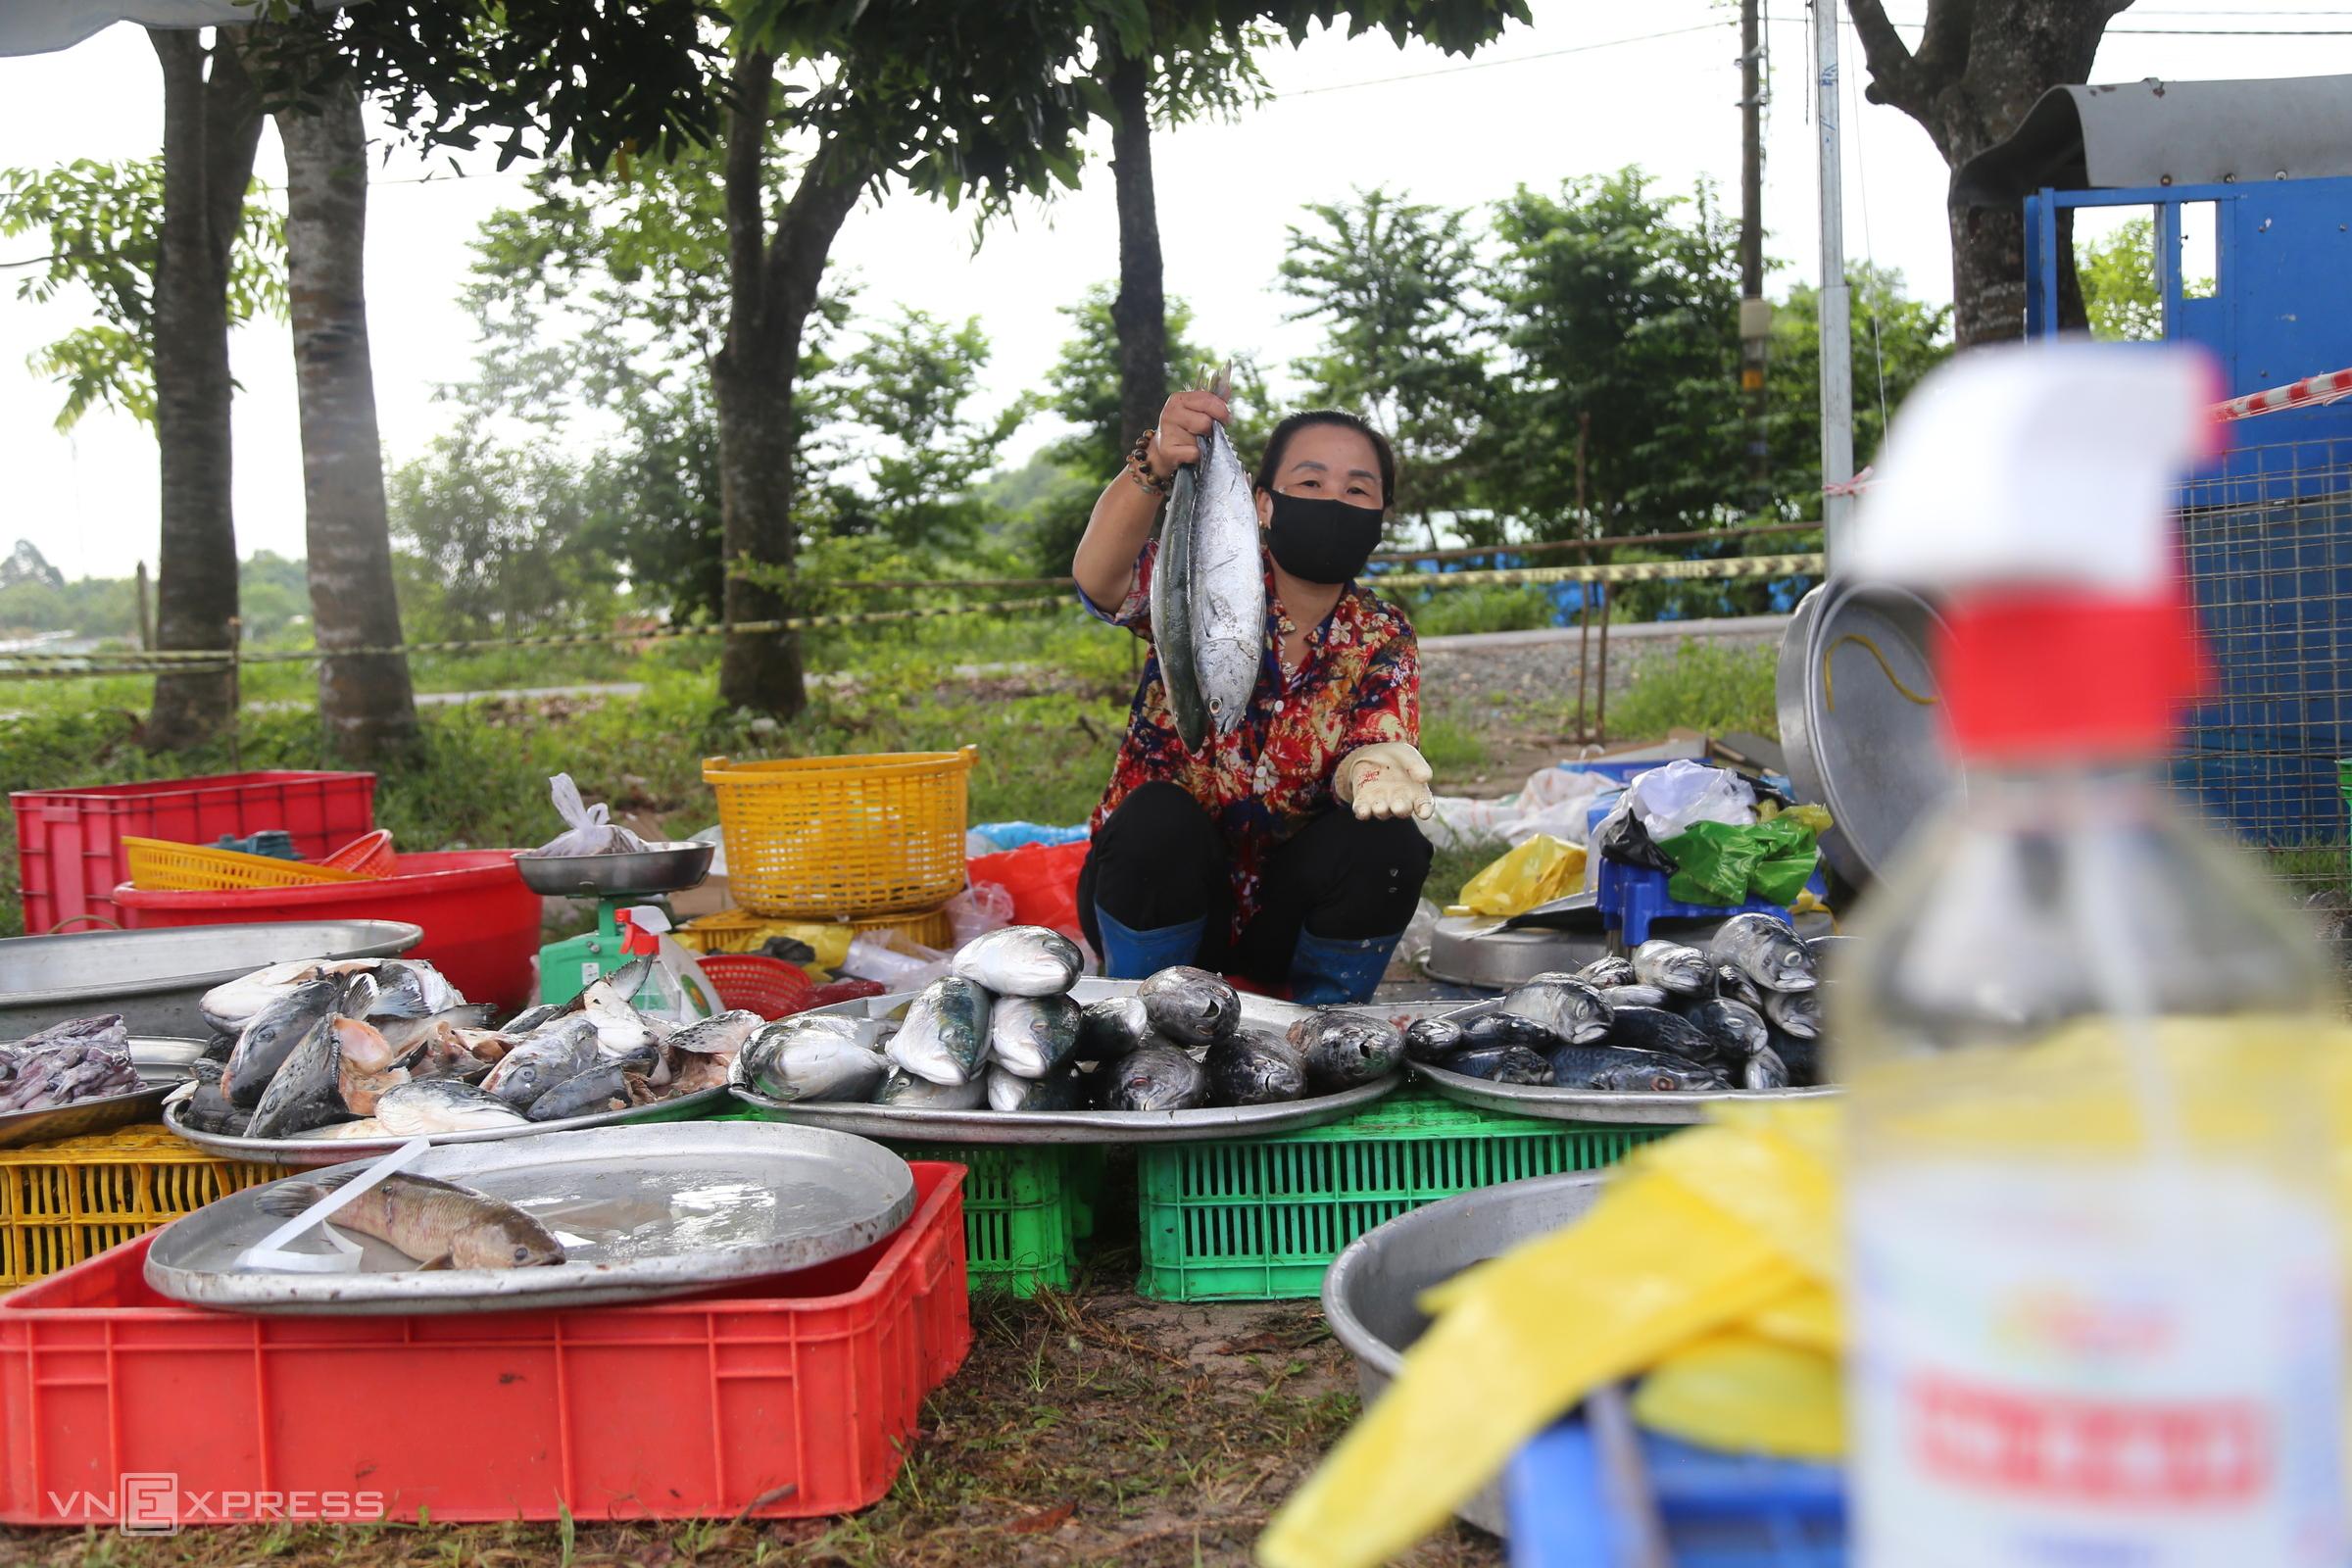 HCMC makeshift market a lifeline amid Covid-19 restrictions